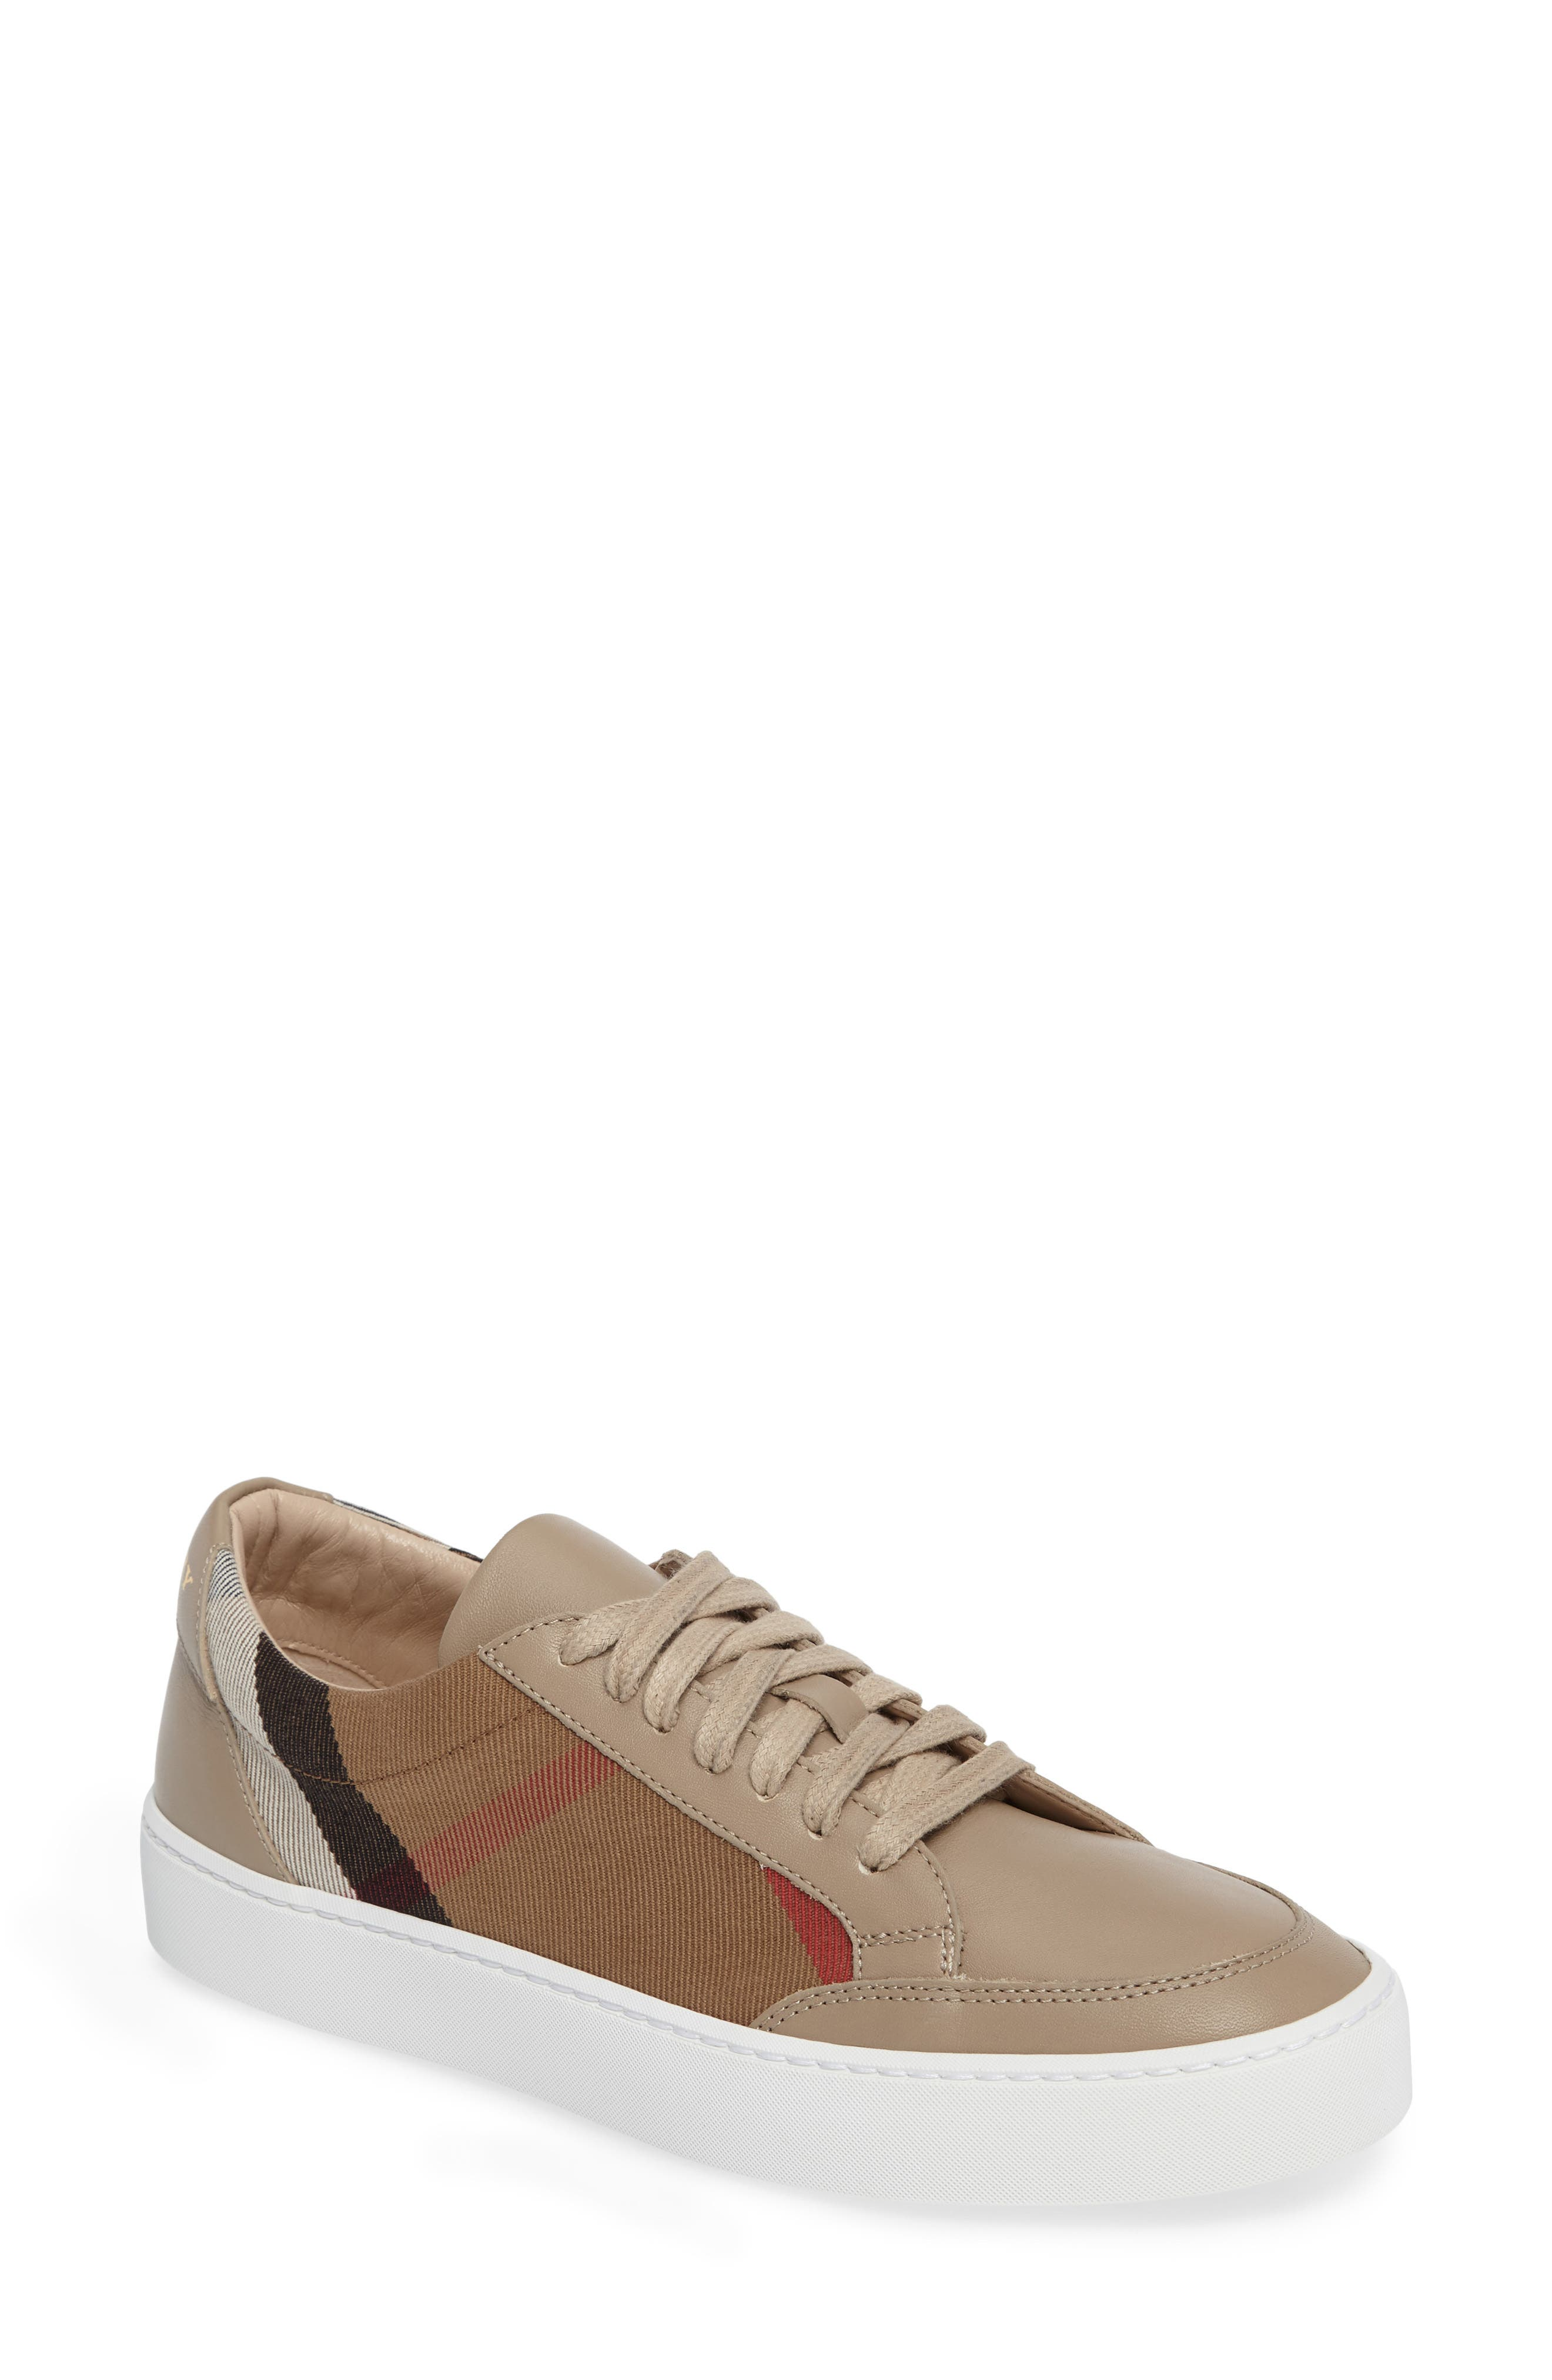 Burberry Salmond Sneaker (Women)